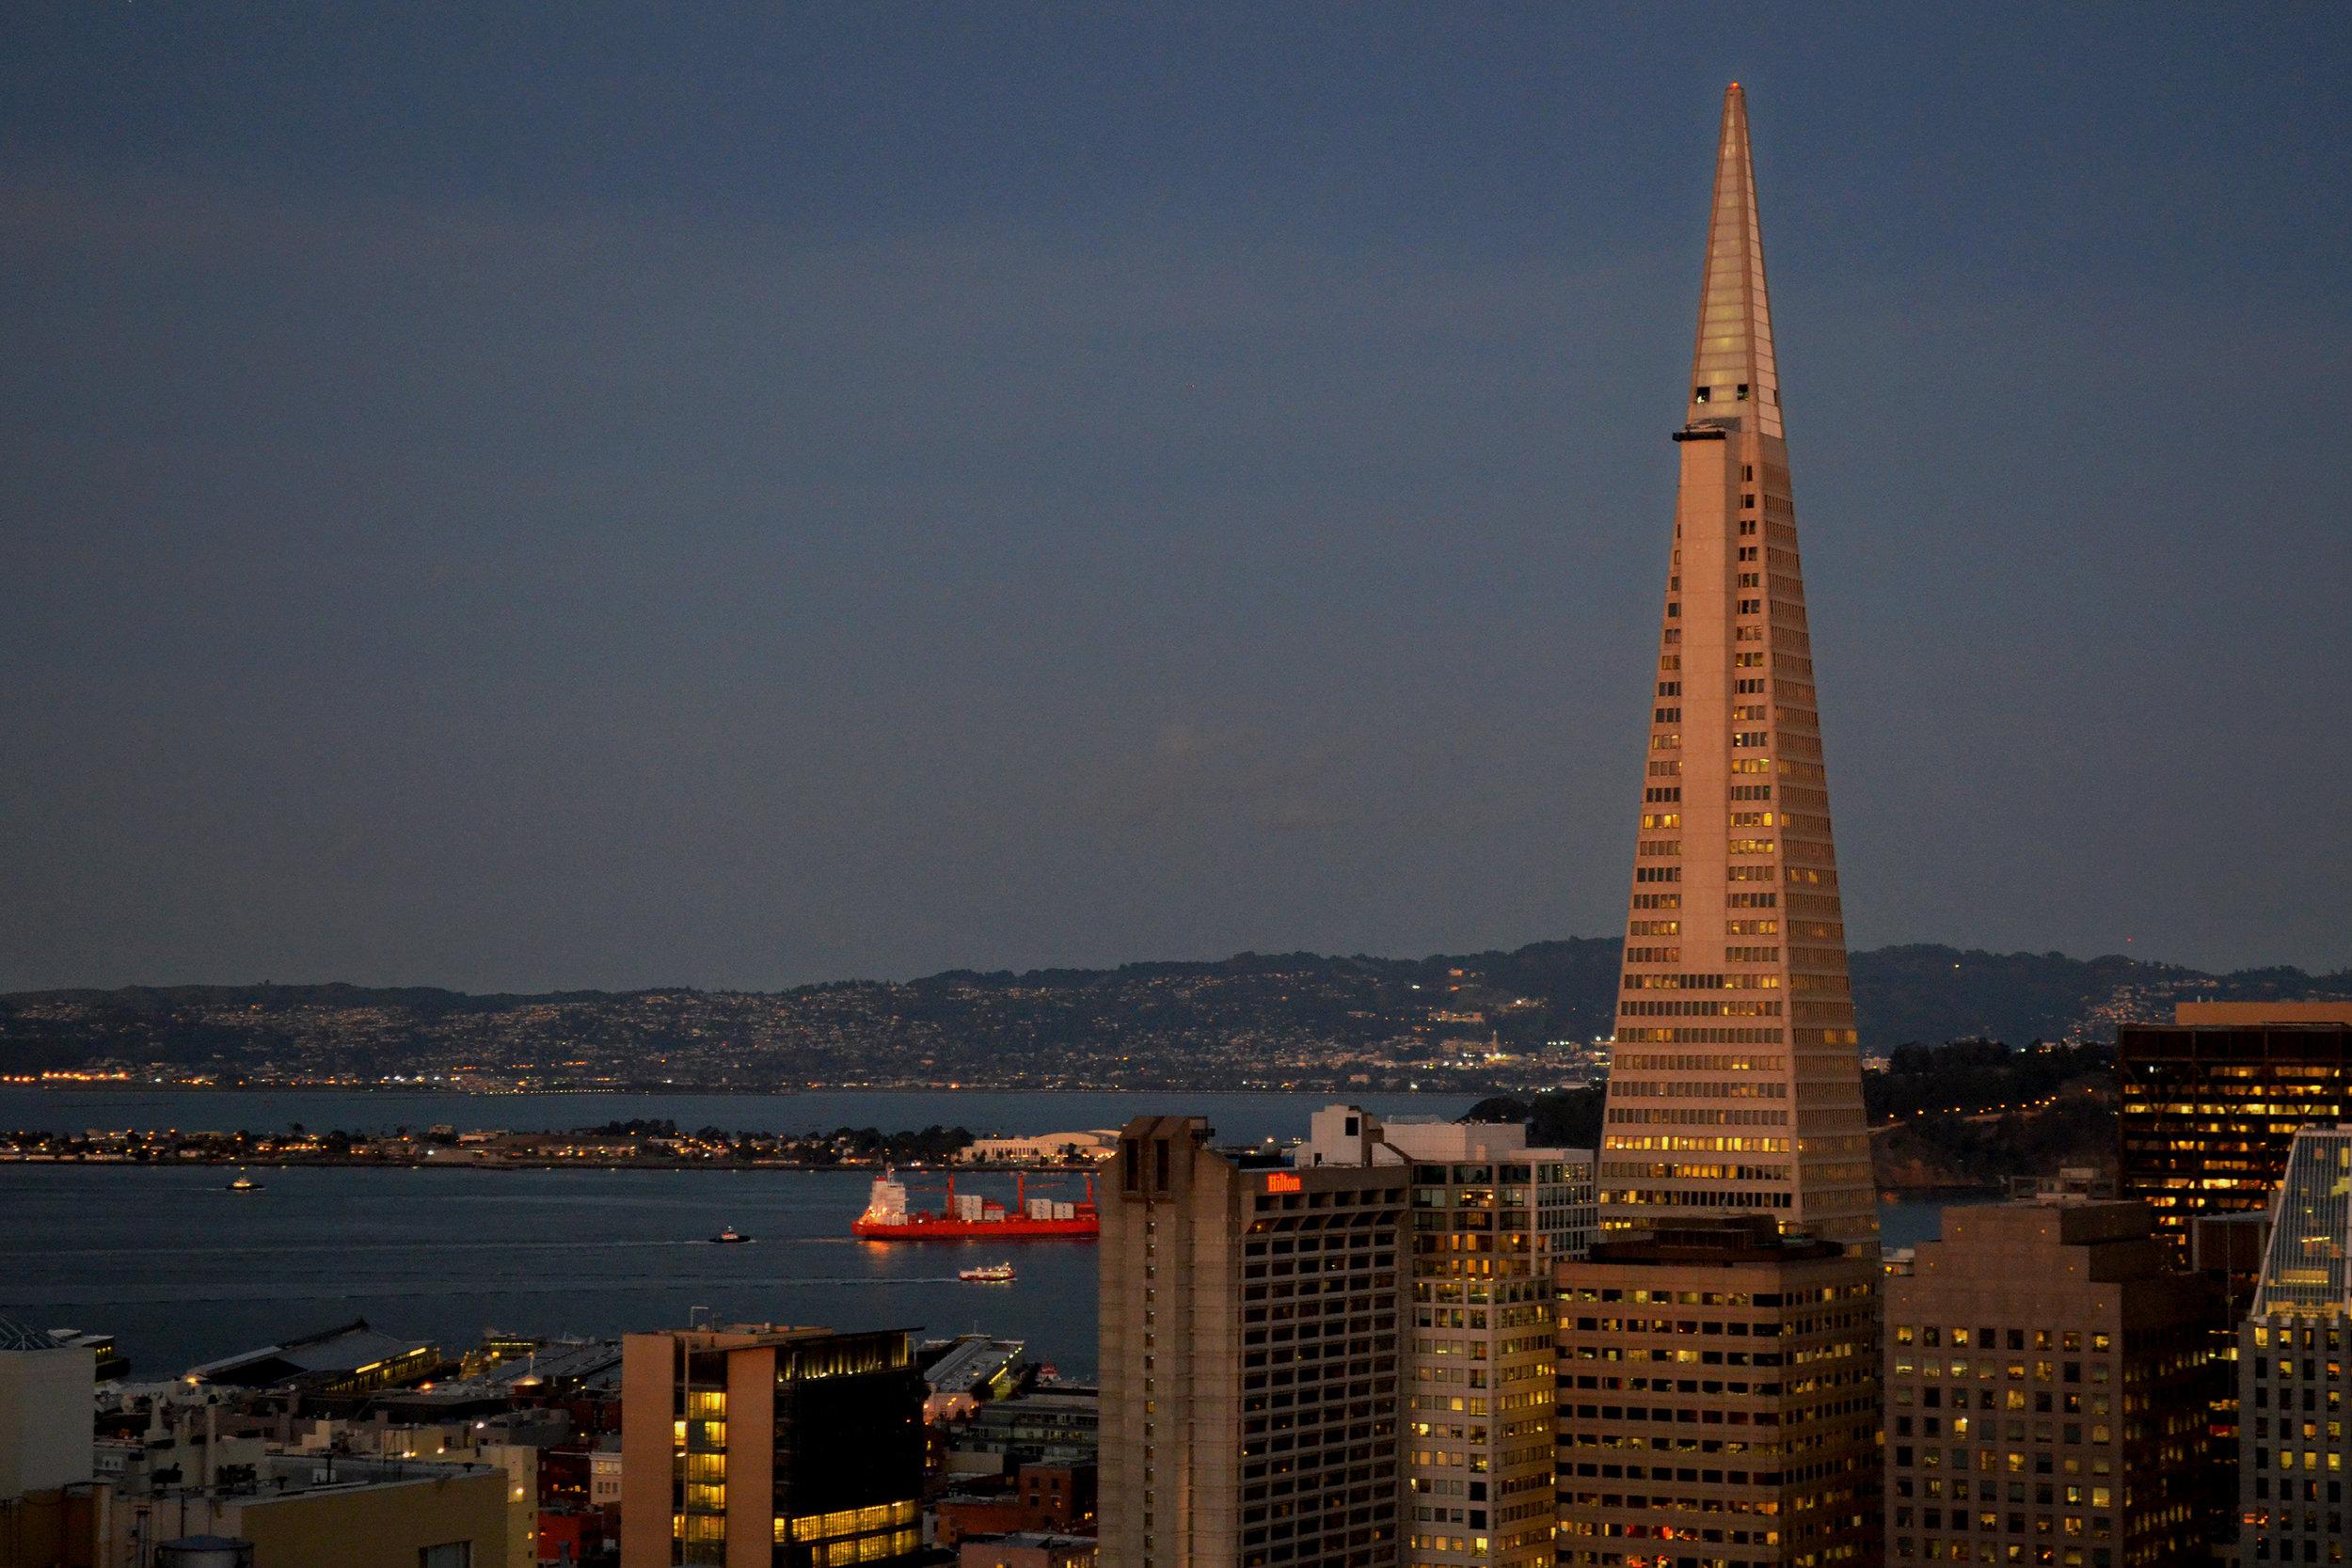 Night falls on the San Francisco Bay